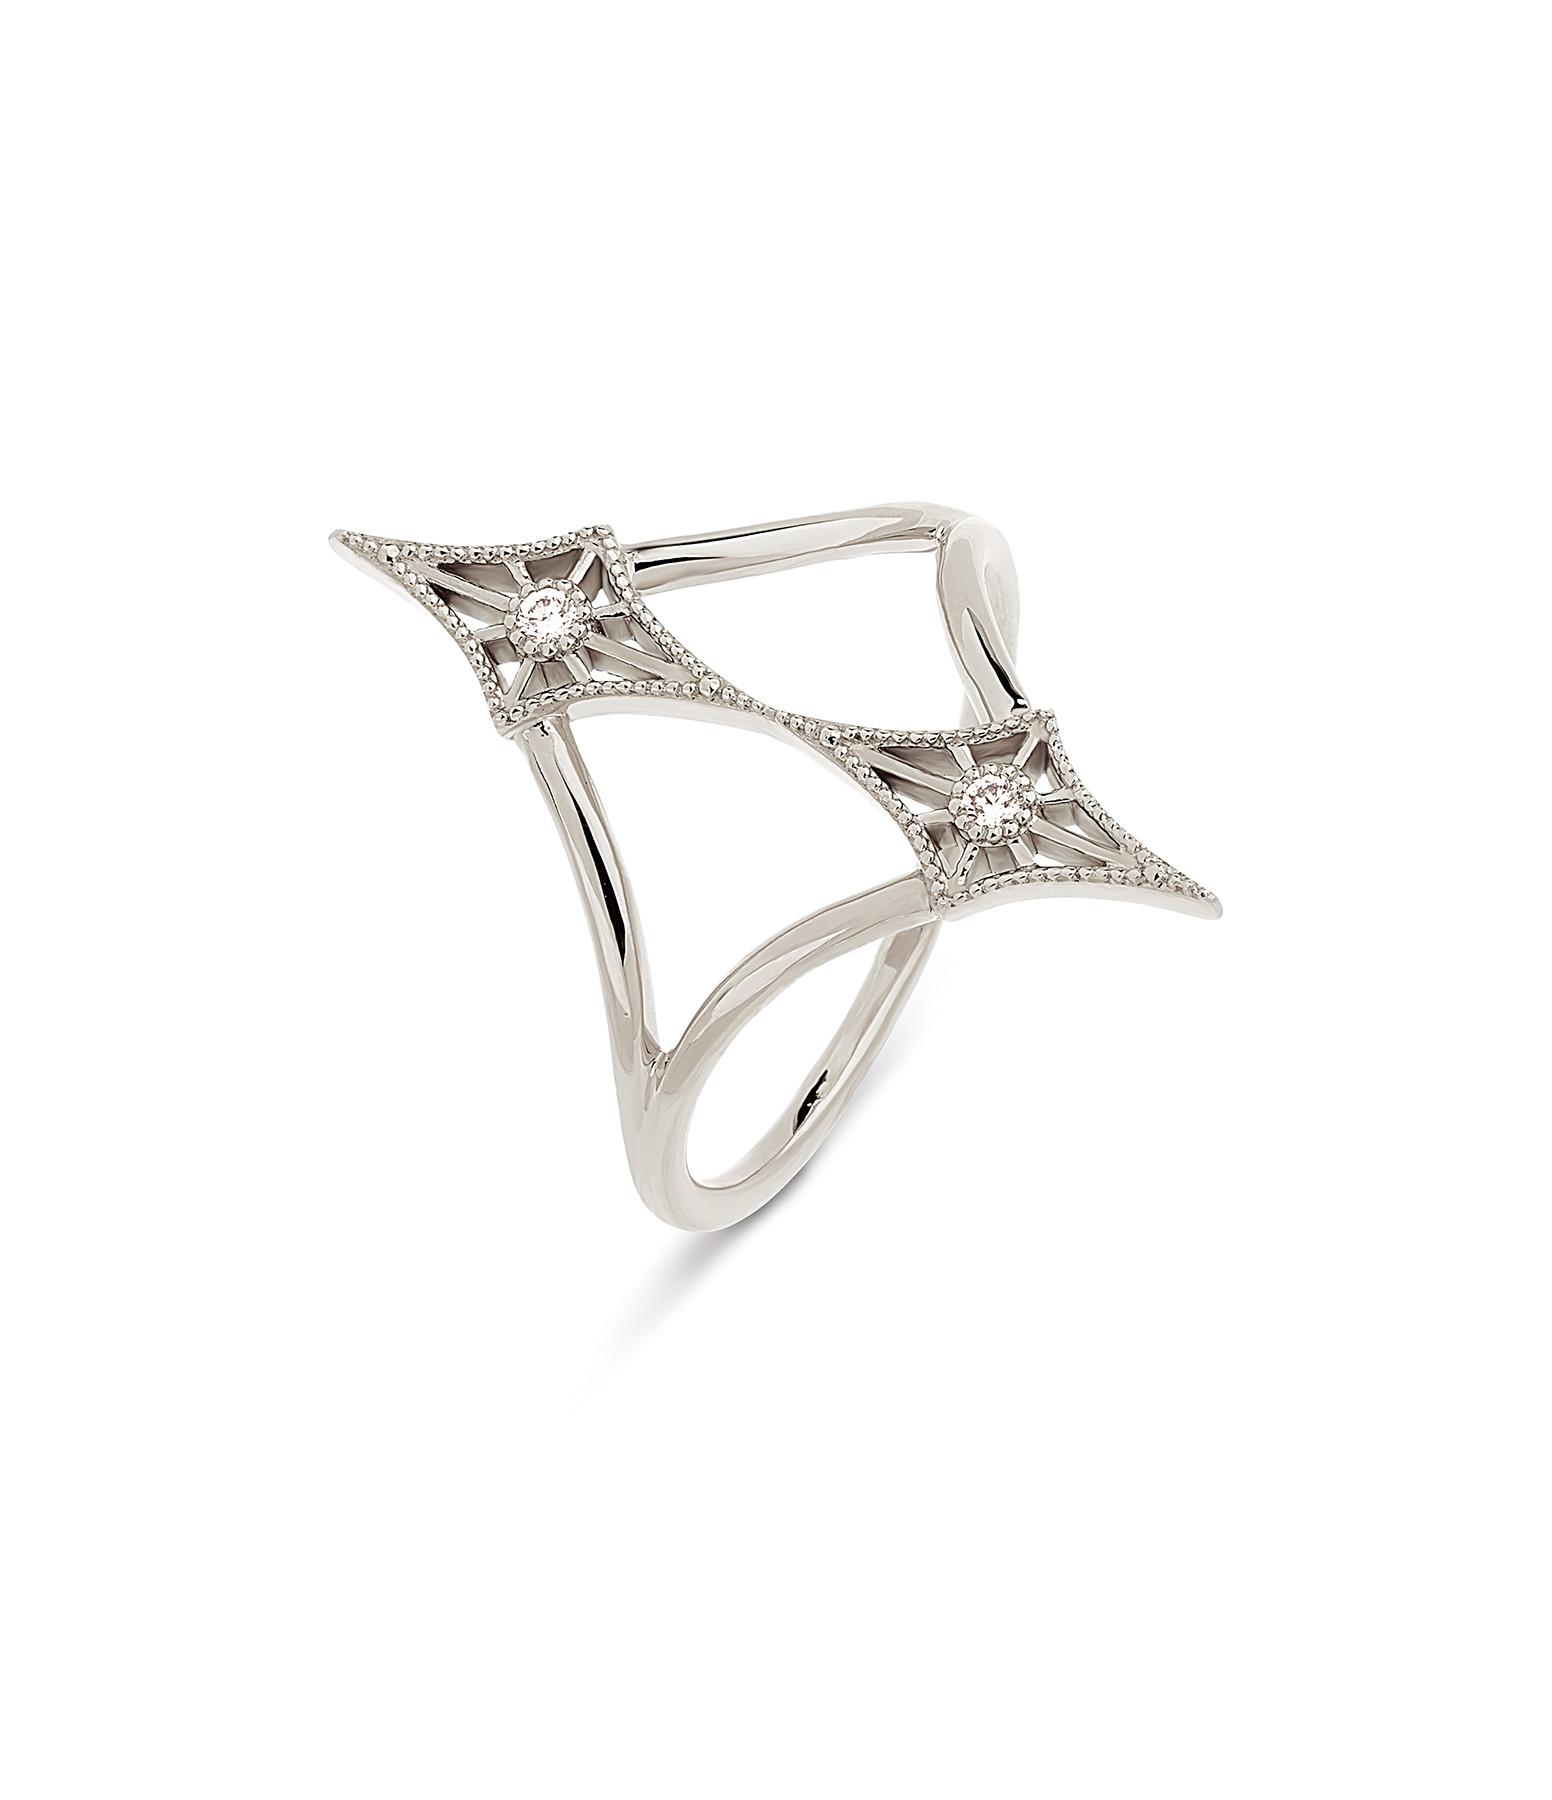 NAVA JOAILLERIE - Bague Cheyenne Losange Double Diamants Or Blanc